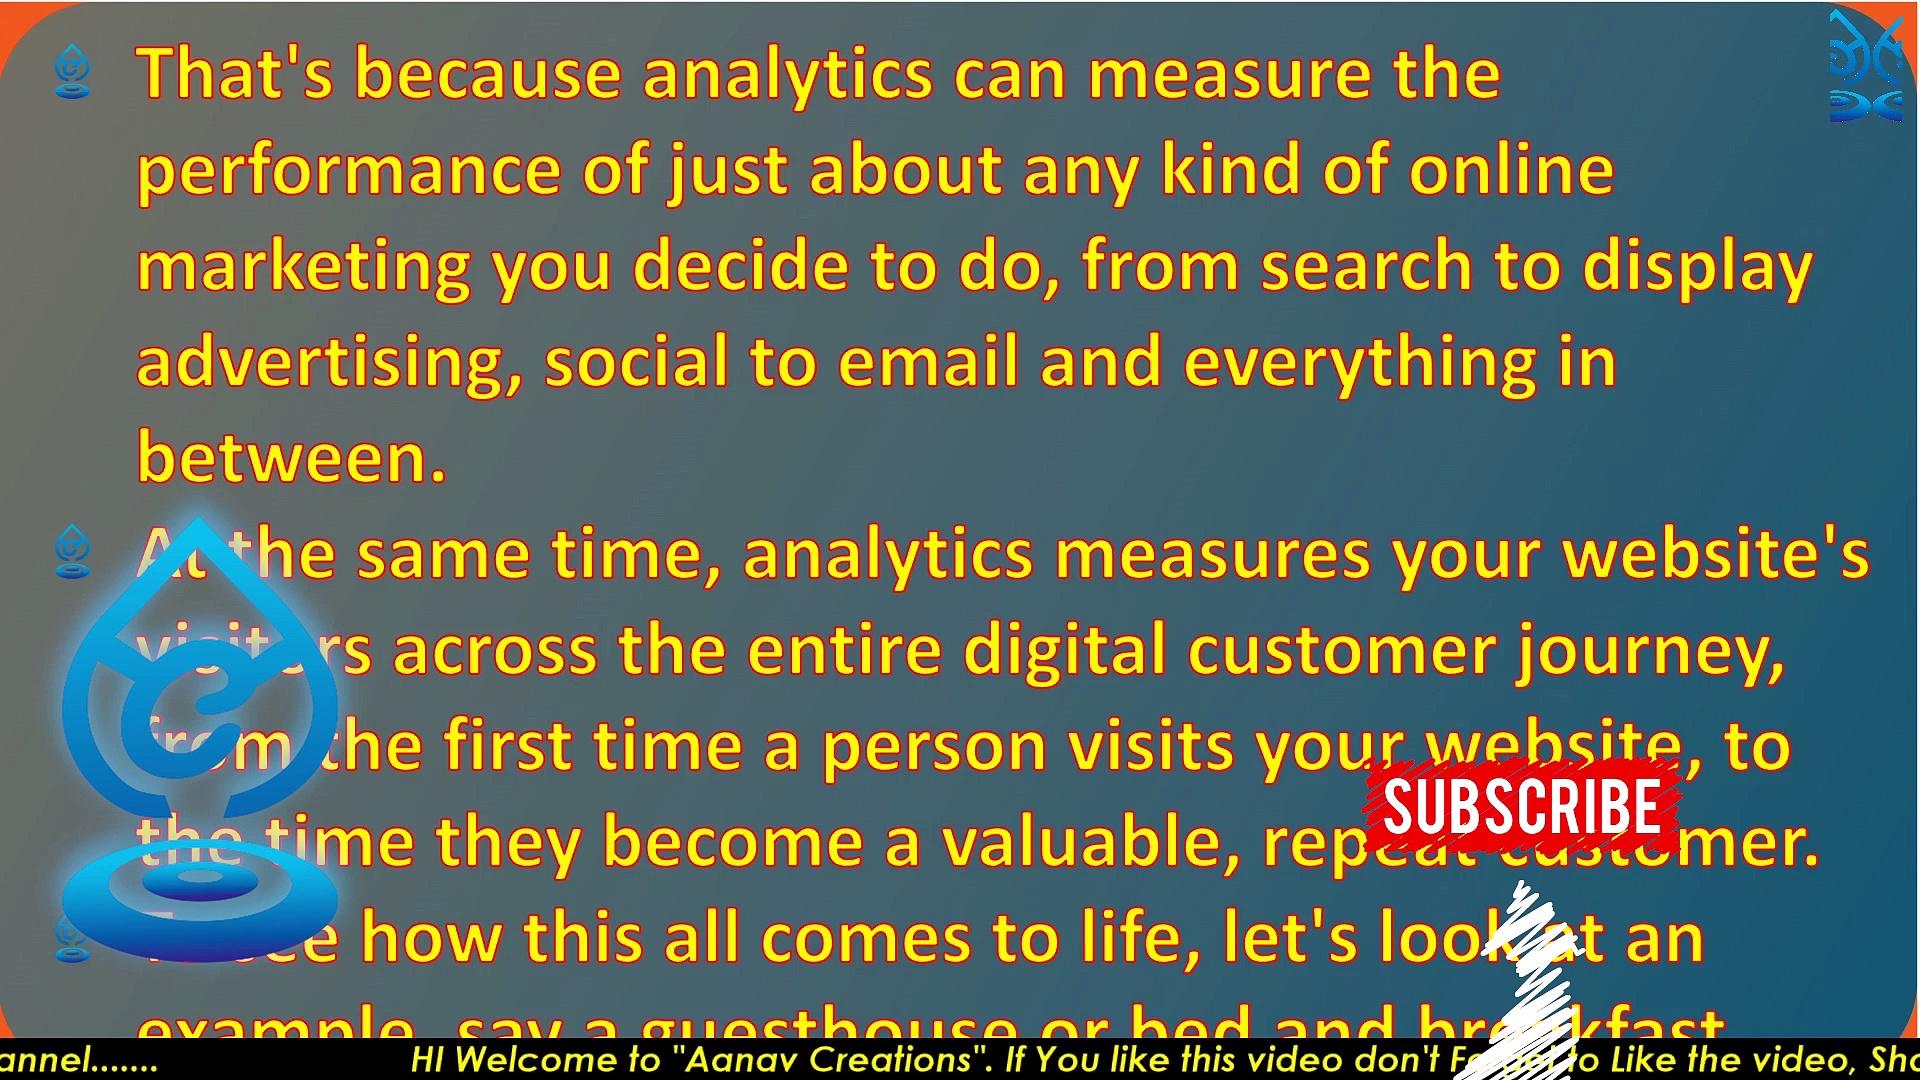 Making web analytics work for you |   @Aanav Creations   | Digital Marketing | Class 84 | Analytics tool |  @Technical Maanav